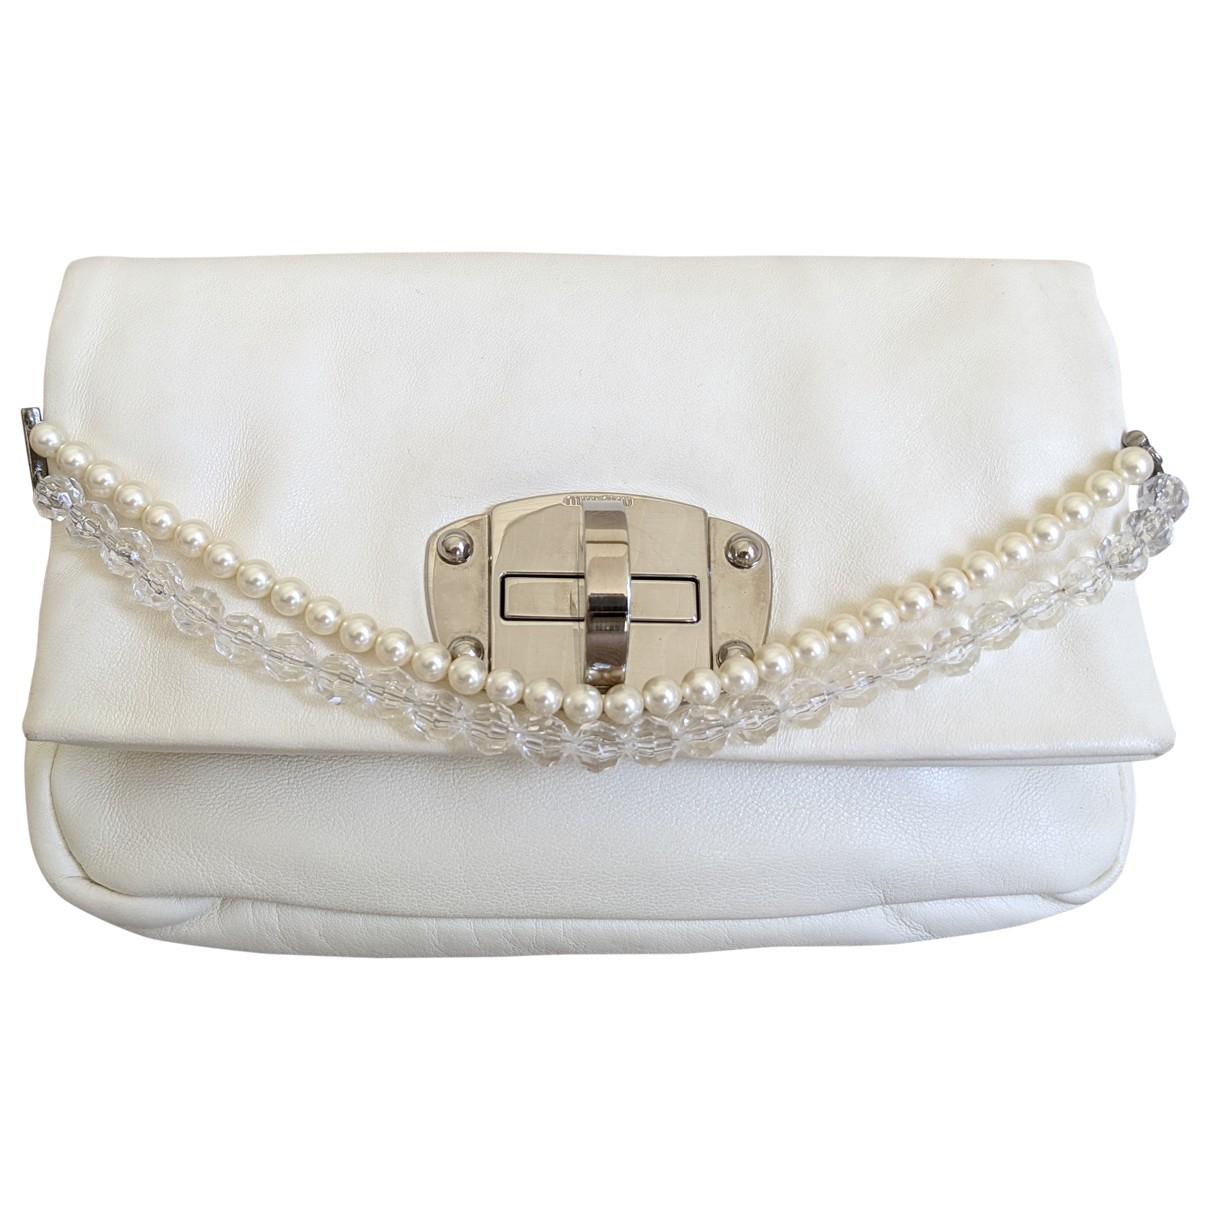 Miu Miu - Pochette Miu Crystal pour femme en cuir - blanc